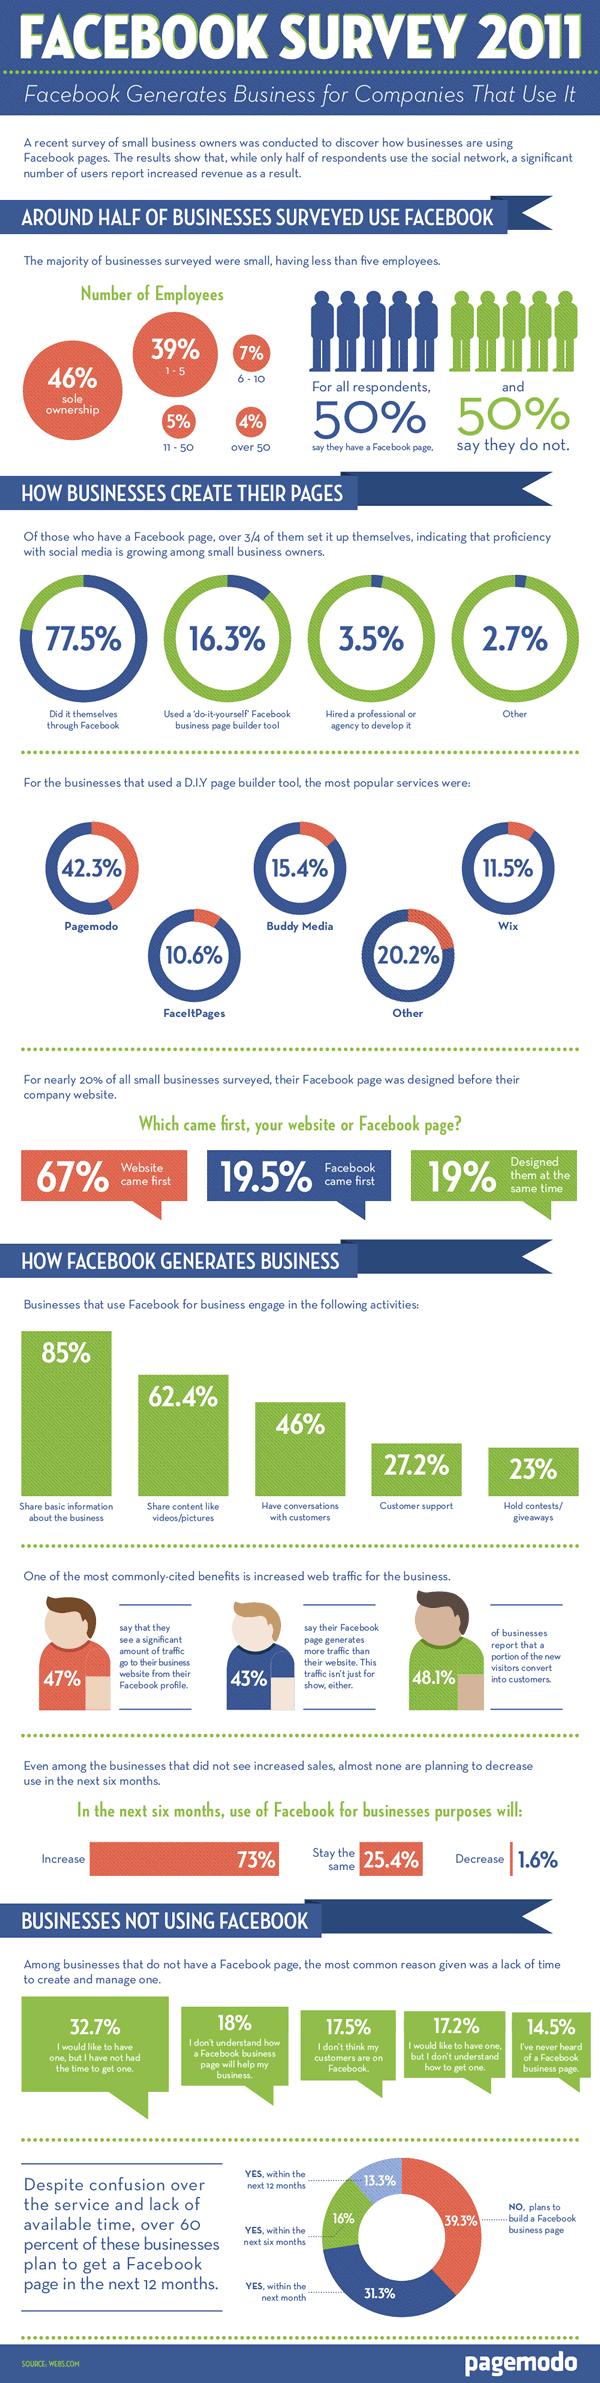 Facebook survey for businesses 2011